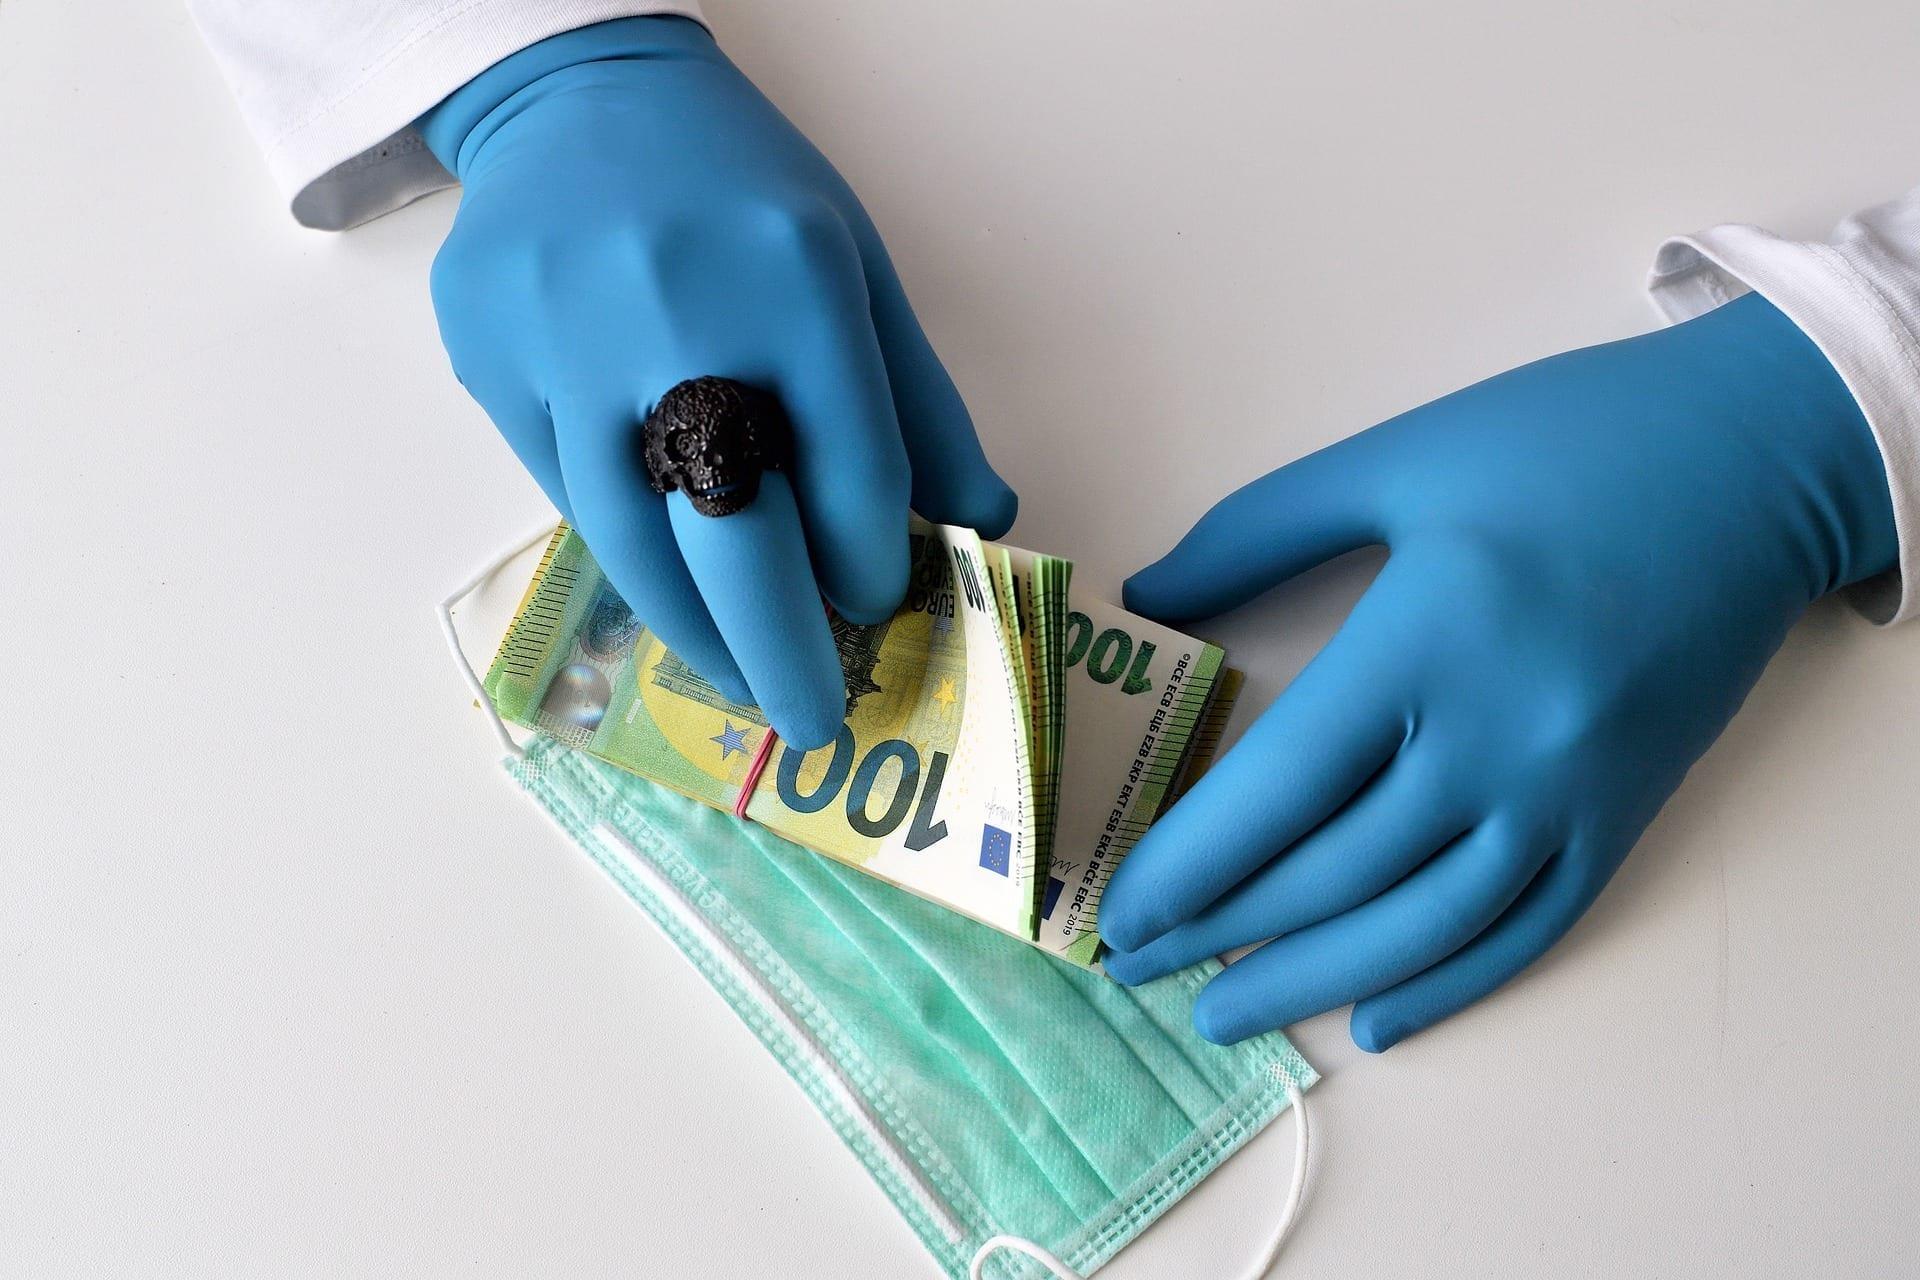 corrupción coronavirus, leo2014 from pixabay